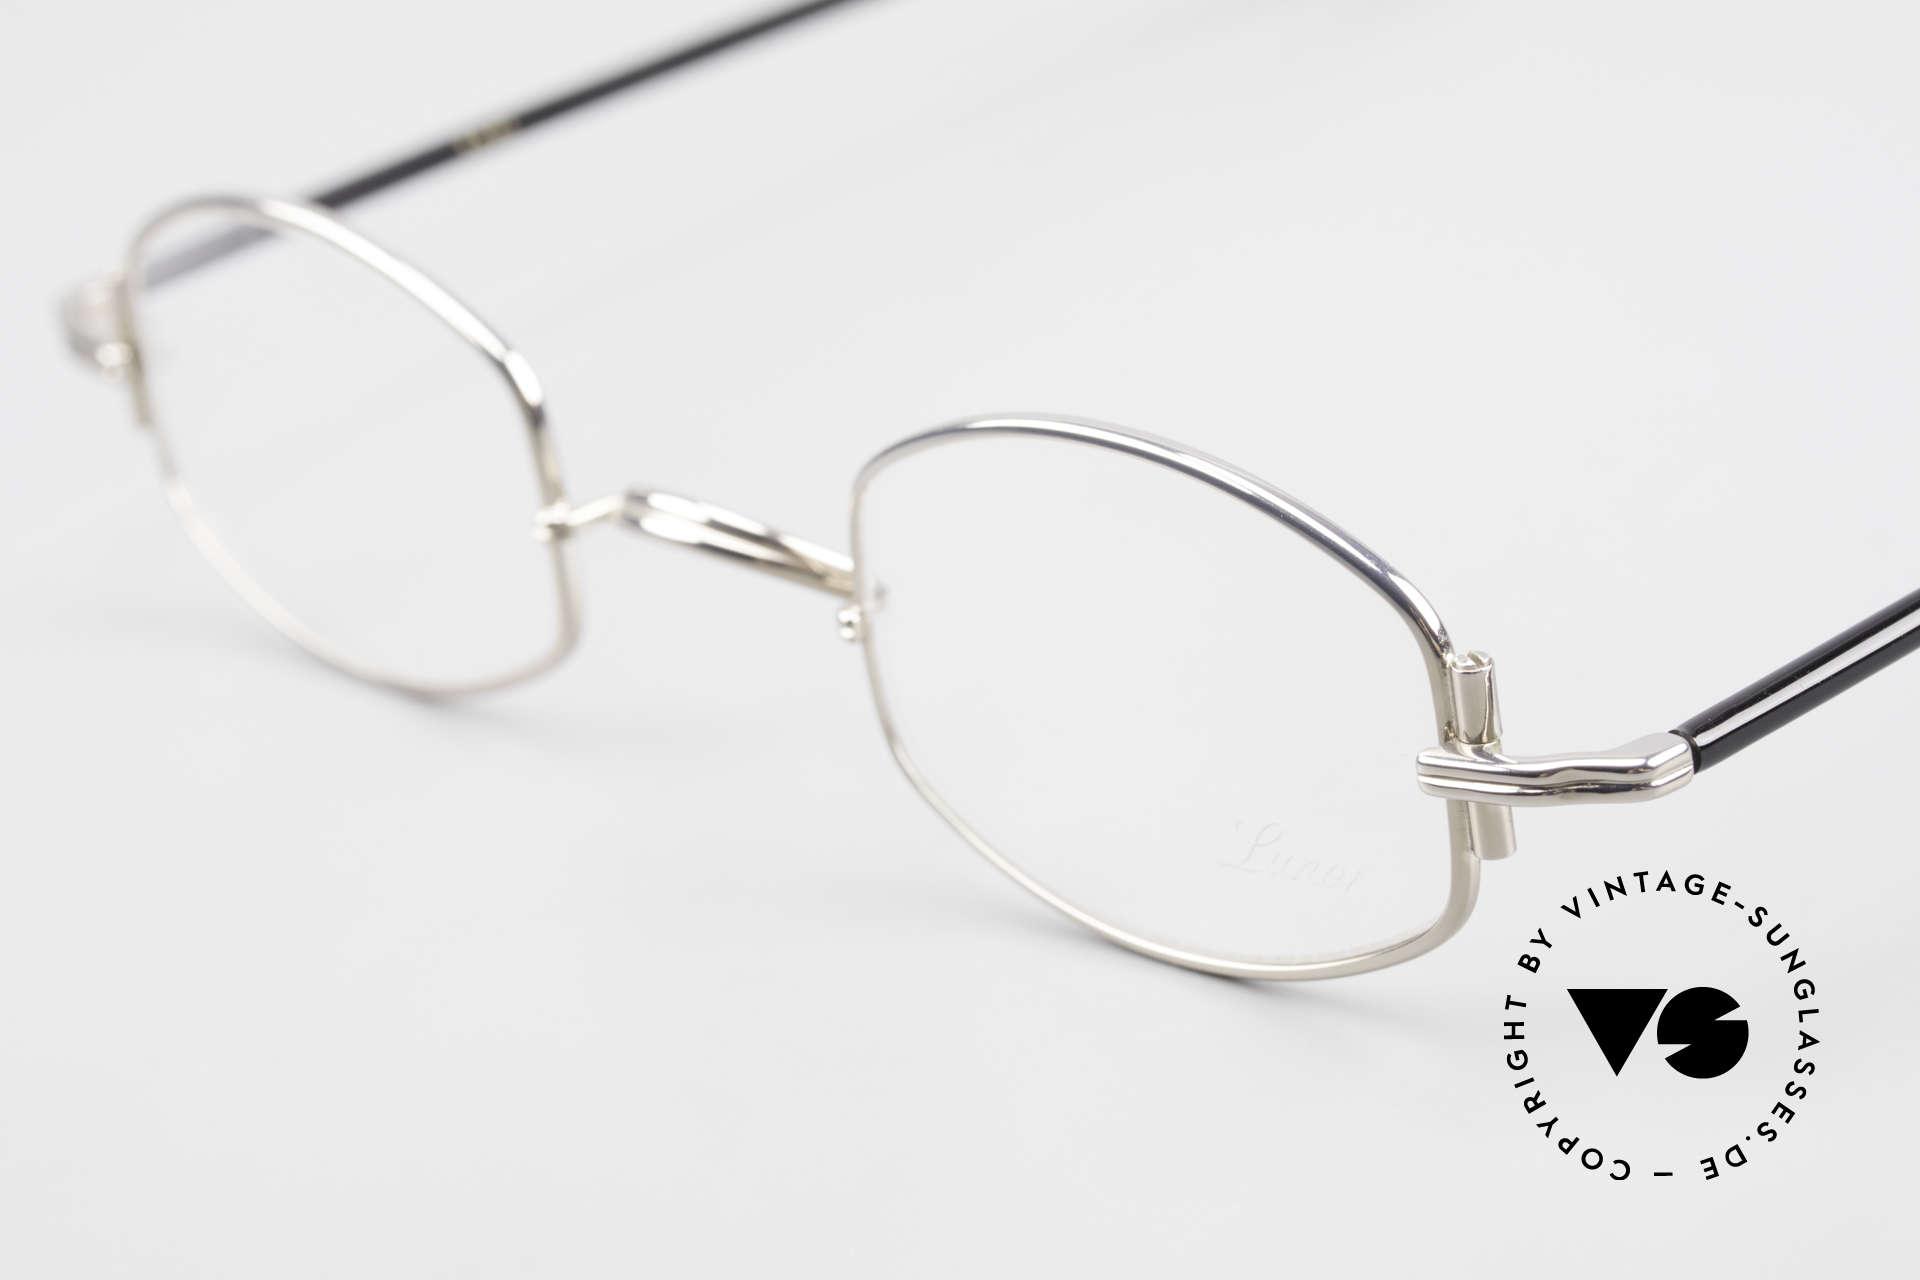 "Lunor XA 03 No Retro Lunor Glasses Vintage, model ""XA 03"" with anatomic bridge and acetate temples, Made for Men and Women"